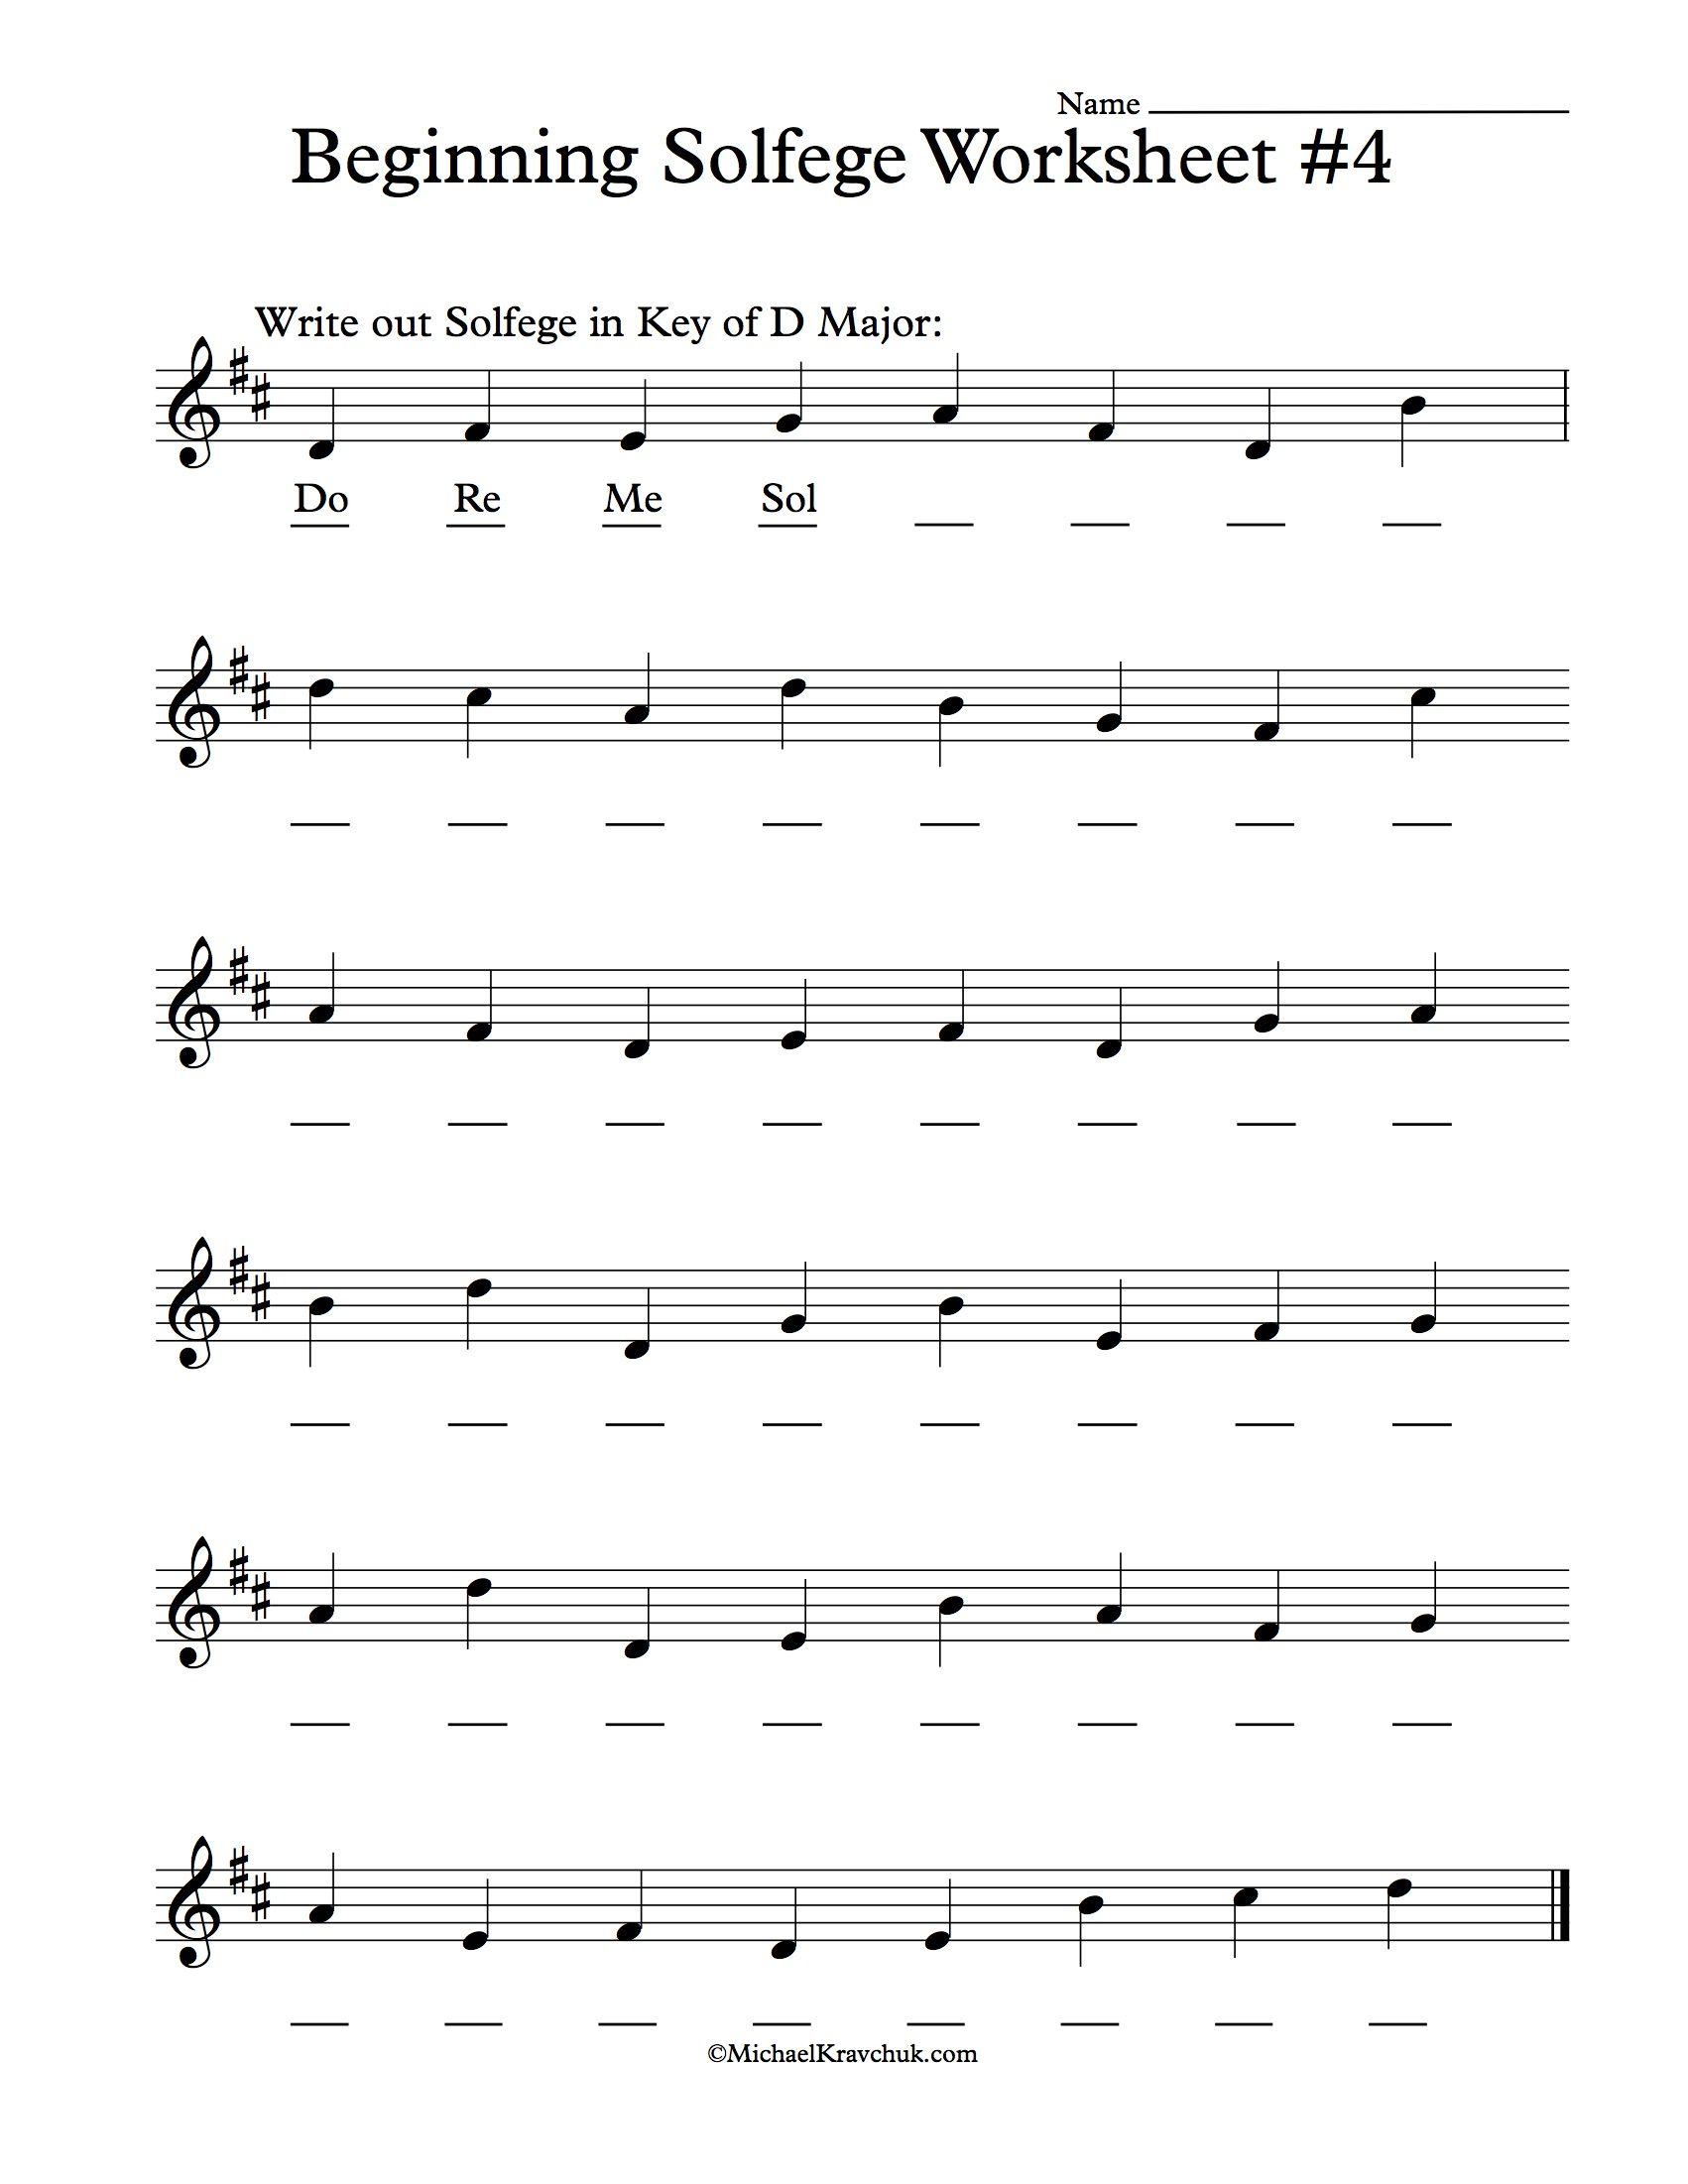 Beginning Solfege Worksheet # 4 For Classroom Instructions ...